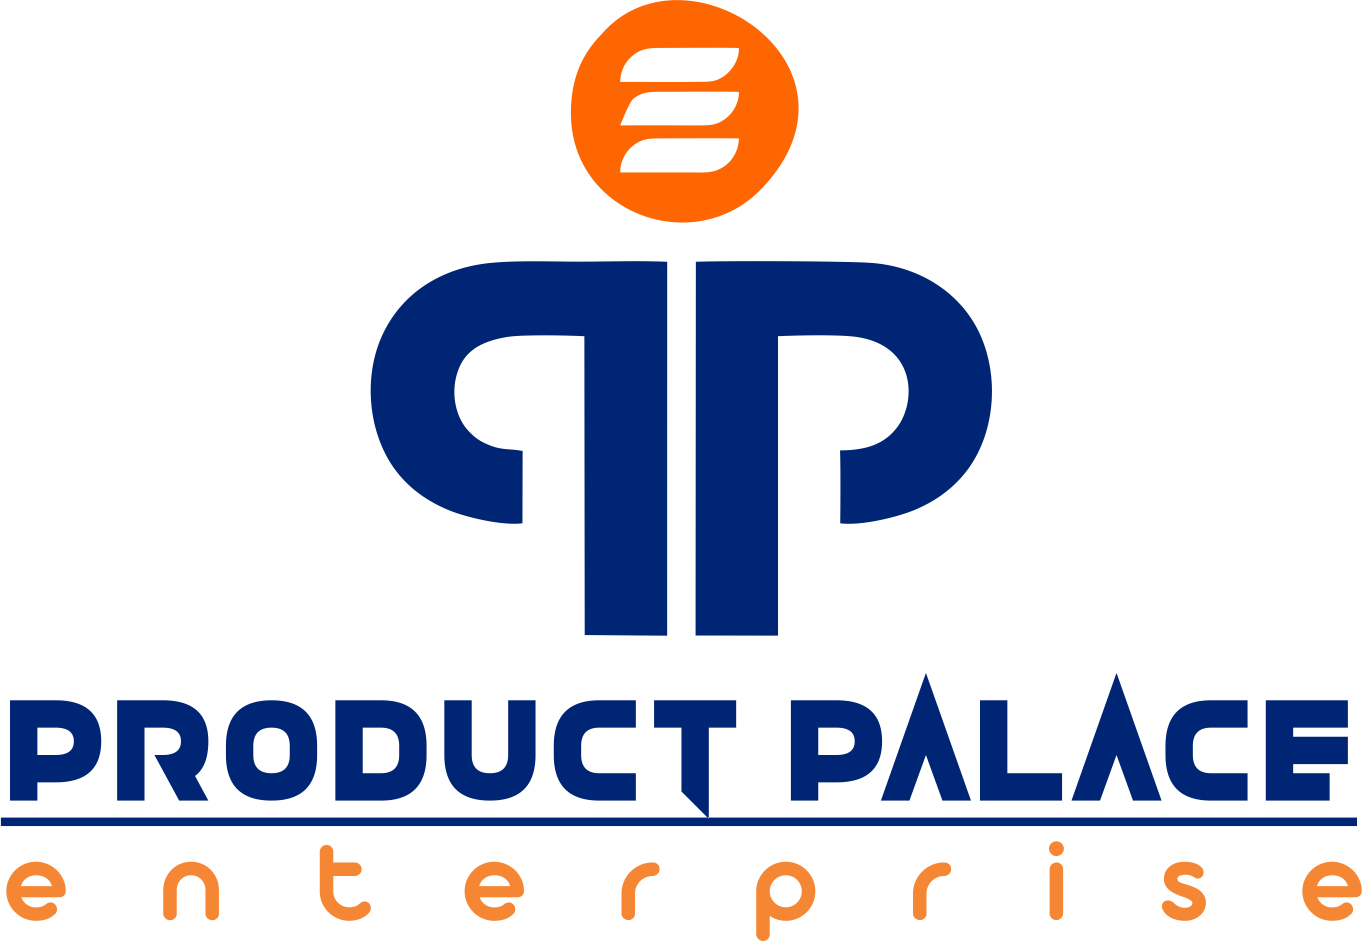 PRODUCT PALACE ENTERPRISE